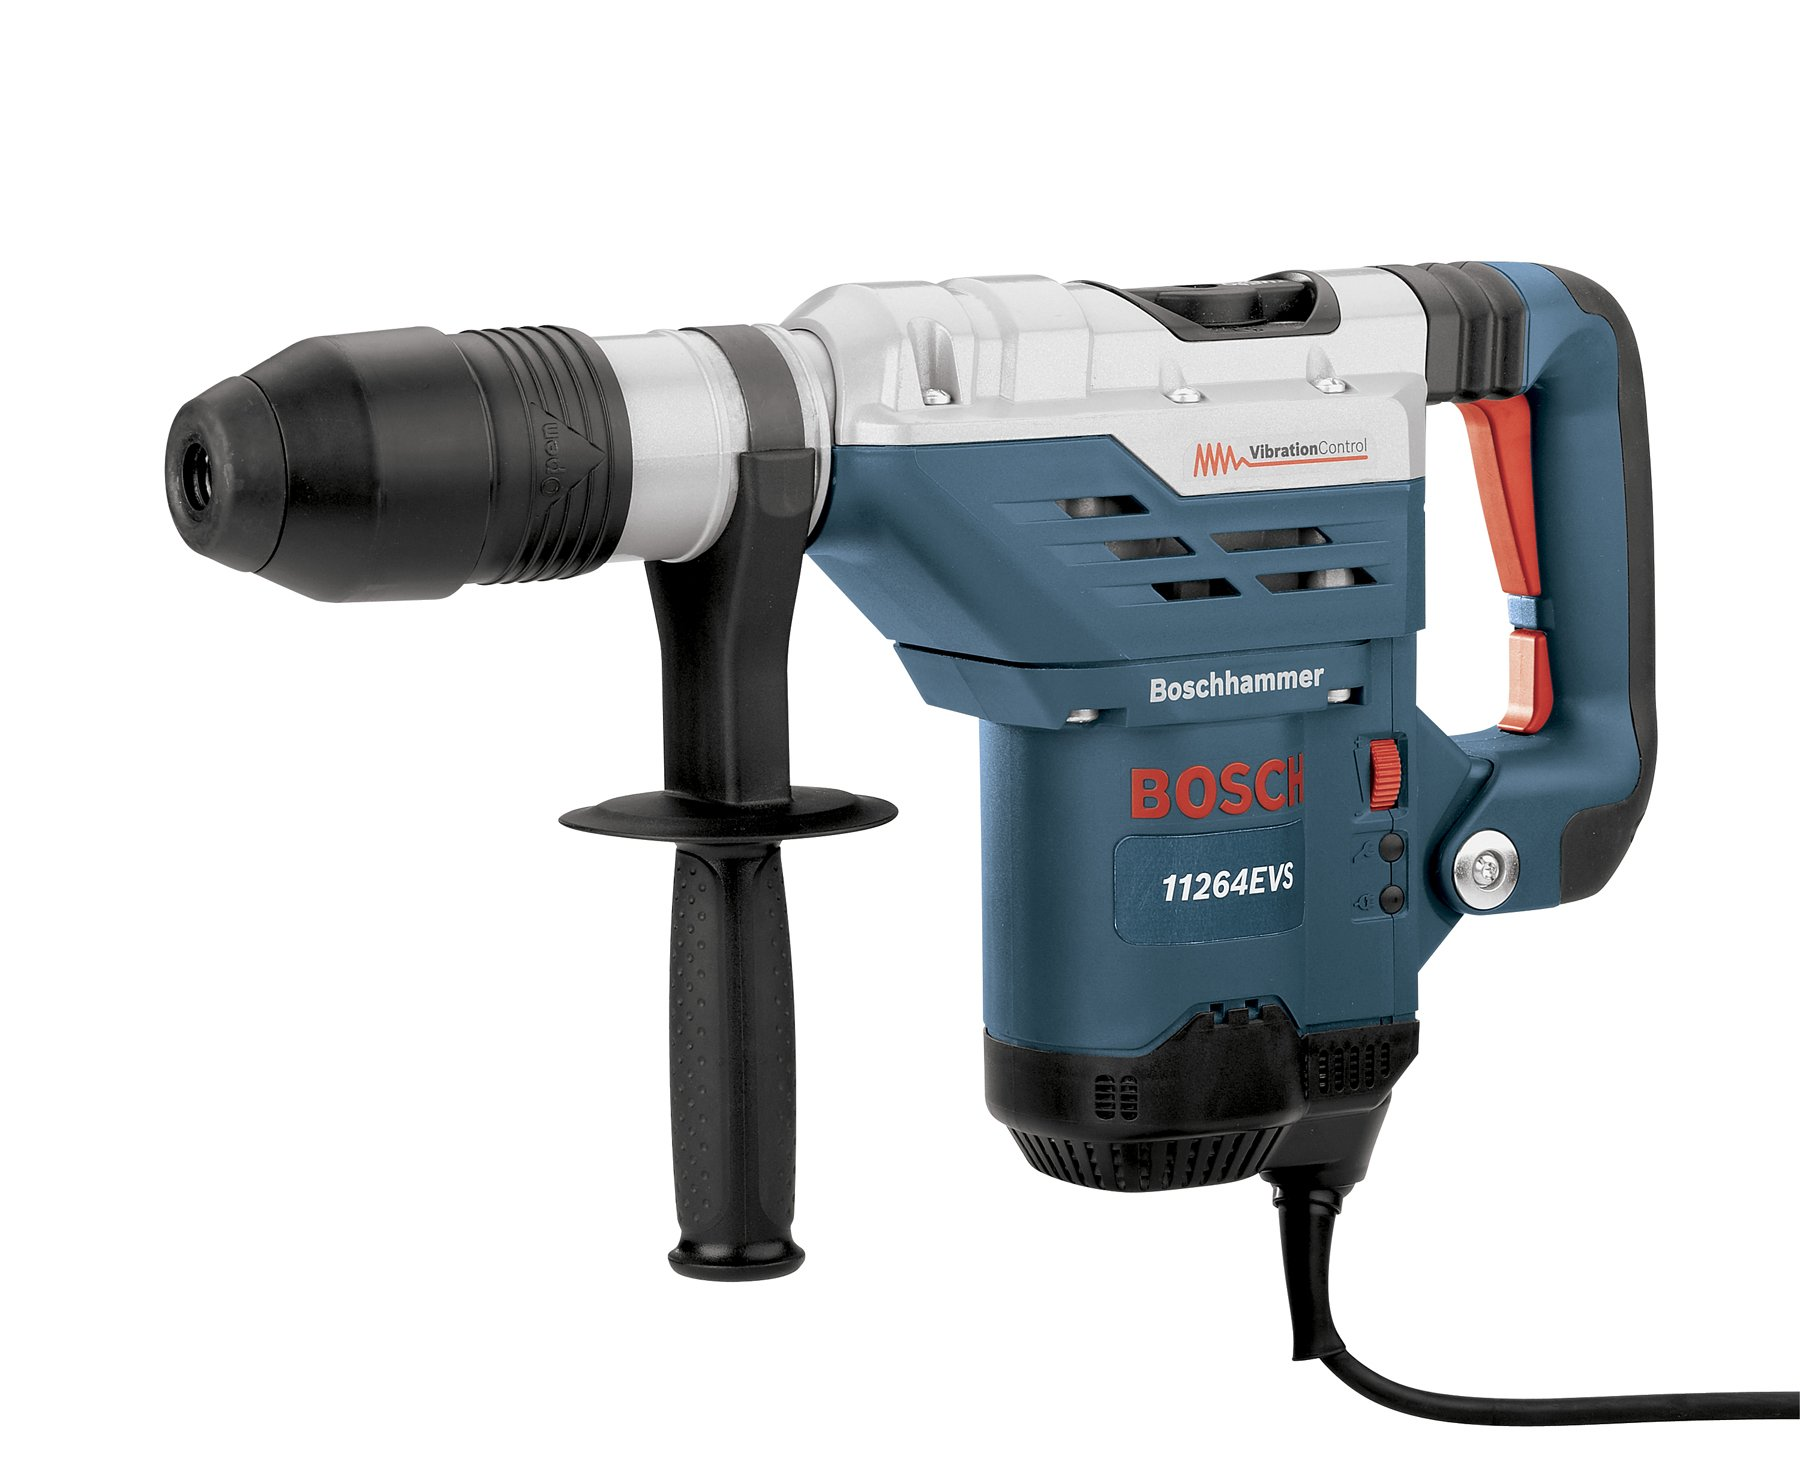 Bosch 11264EVS 1-5/8 SDS-Max Combination Hammer by Bosch